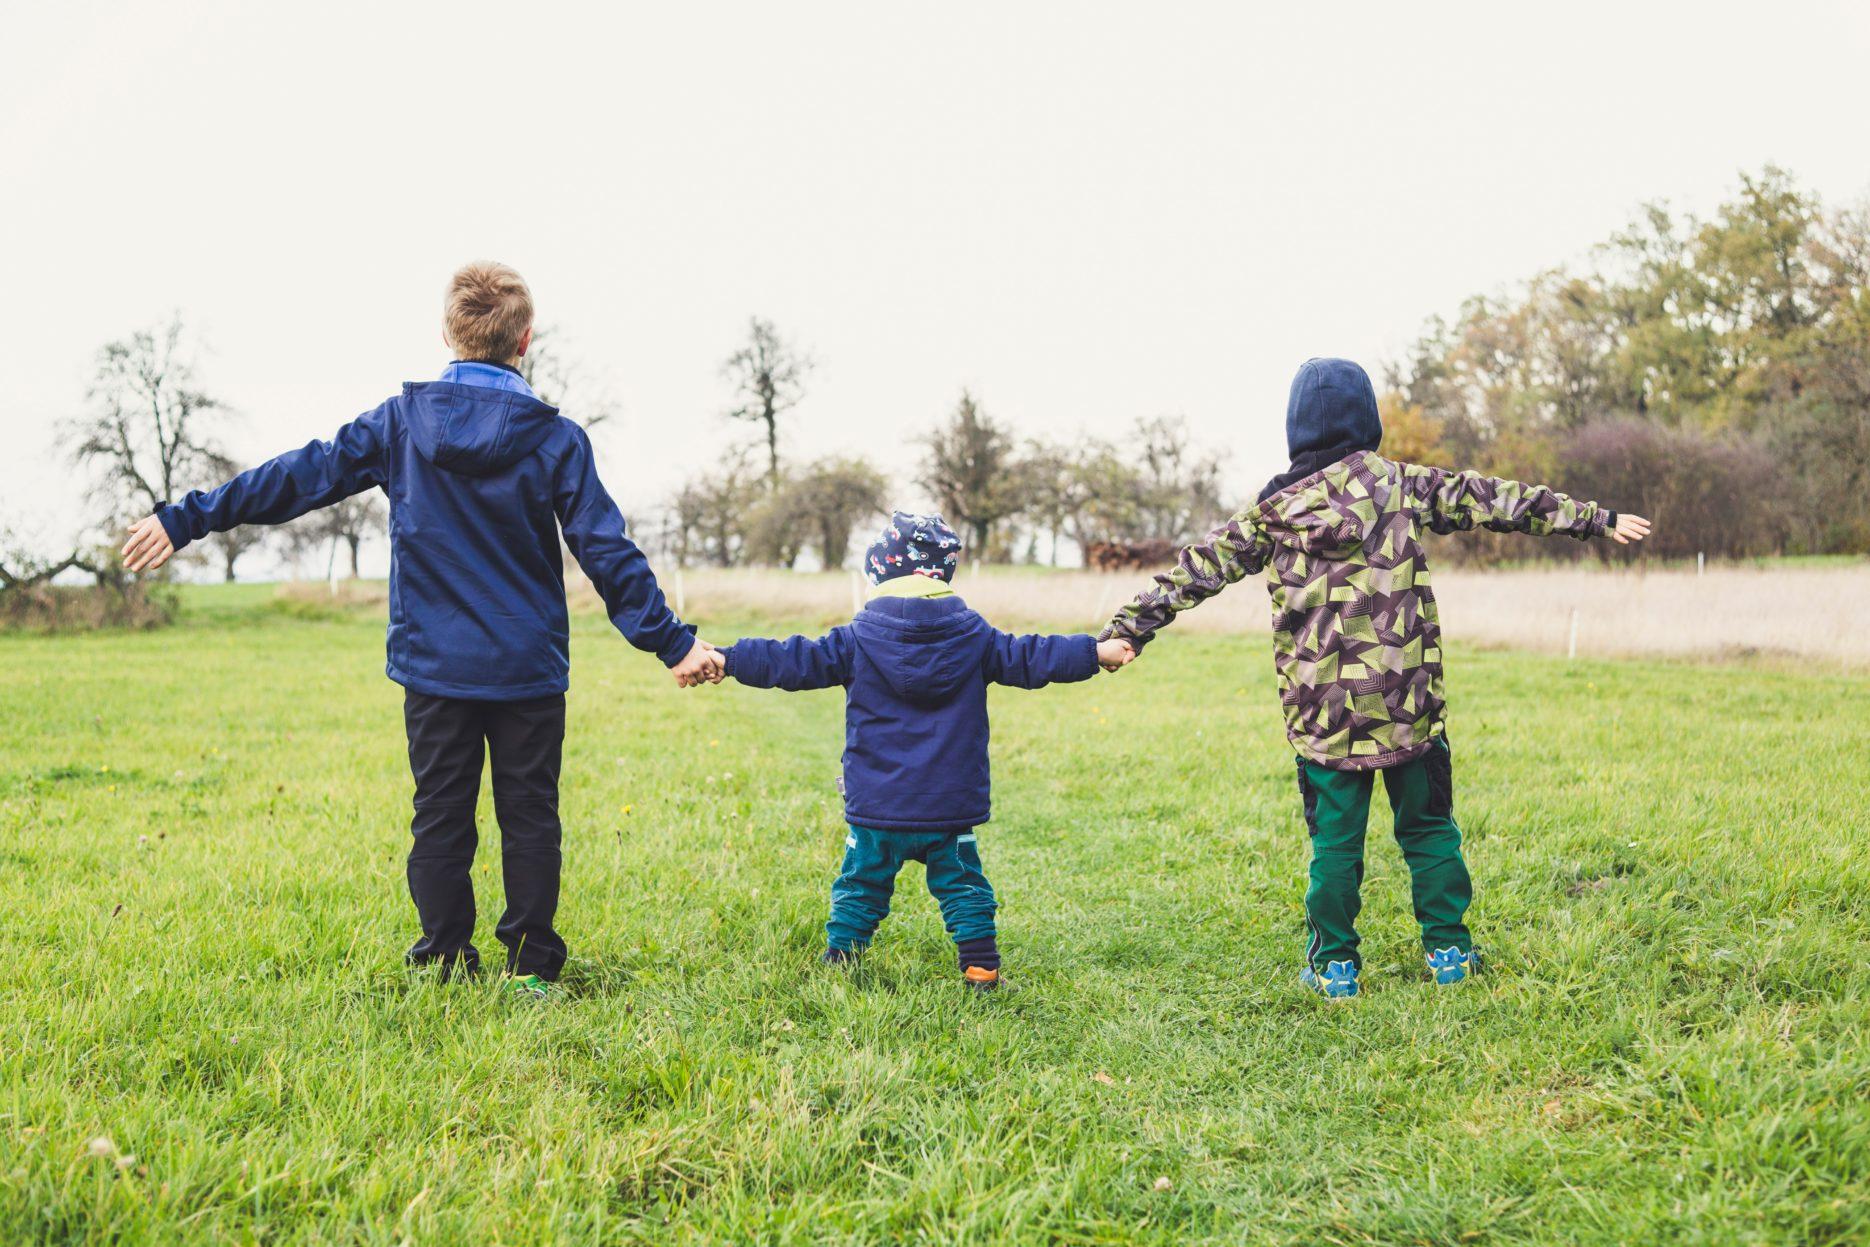 Children playing. Credit: Unsplash